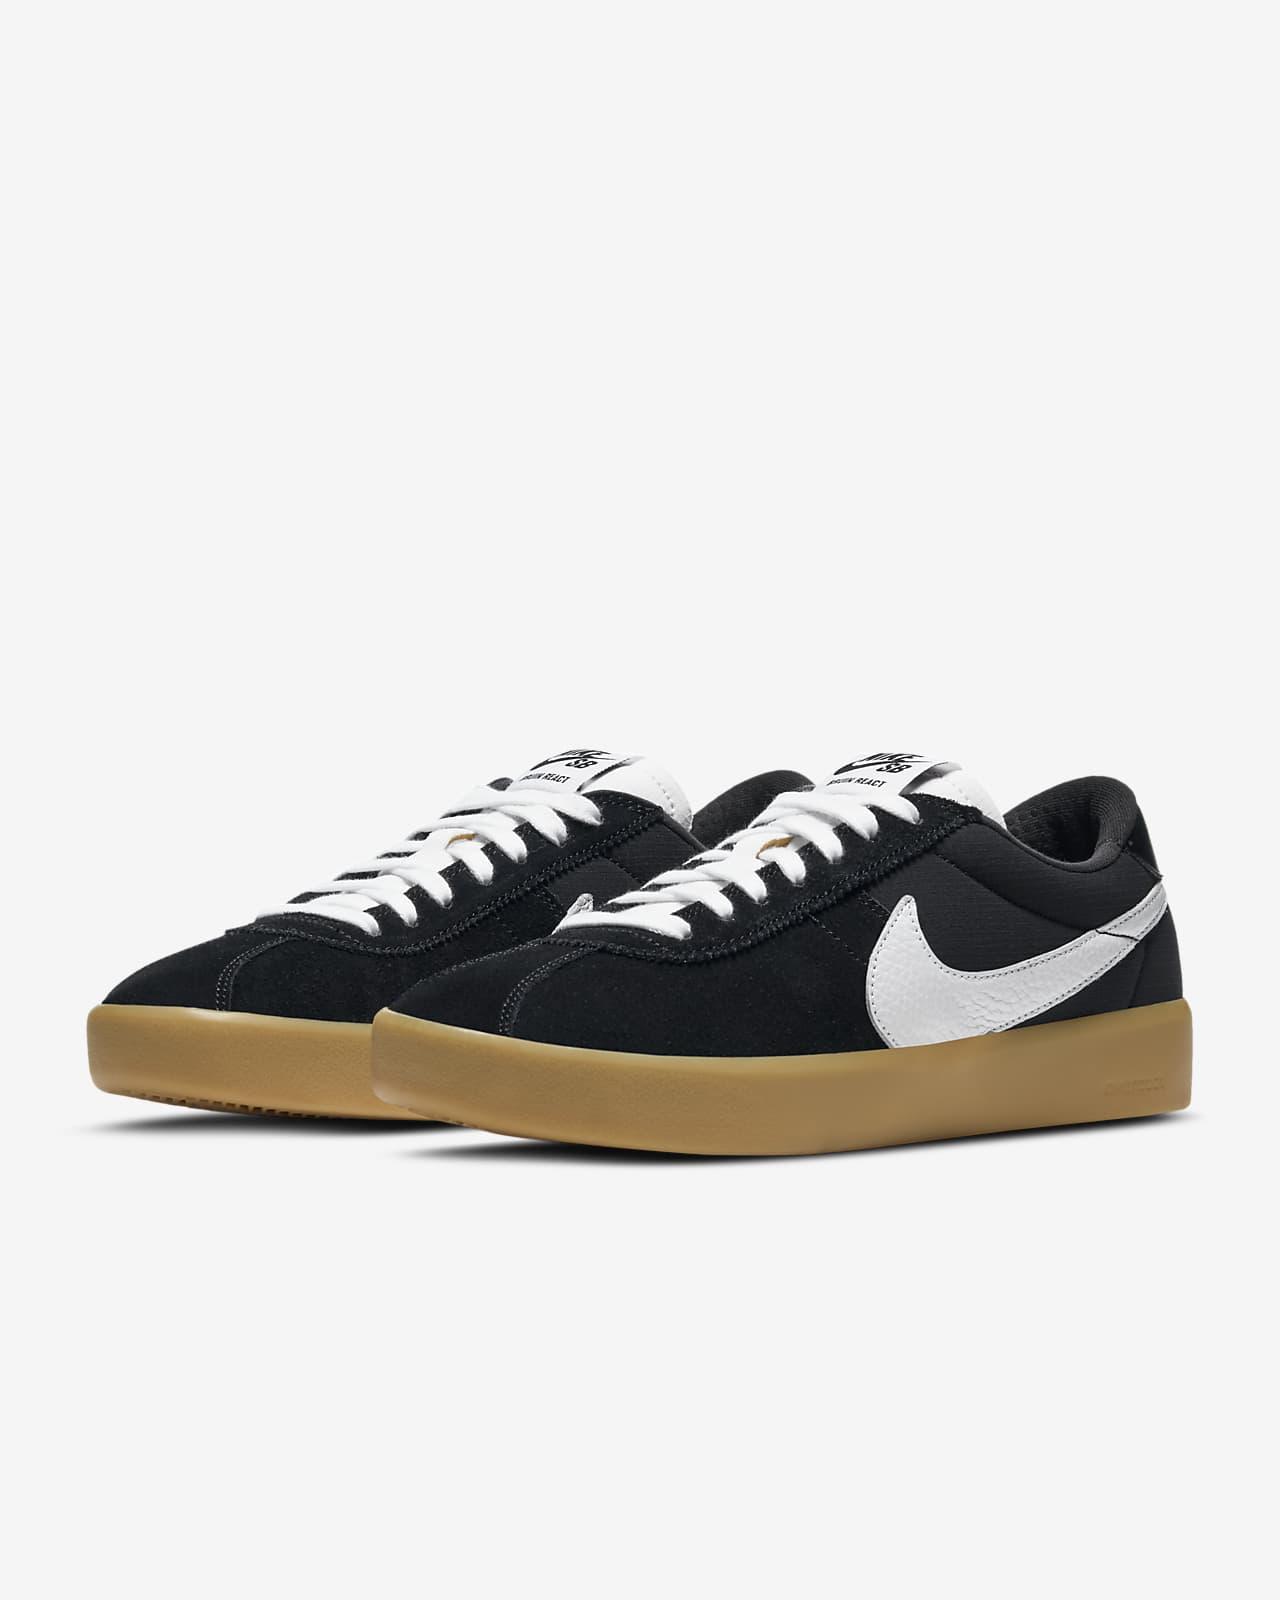 hemisferio esencia Colonos  Nike SB Bruin React Skate Shoe. Nike LU